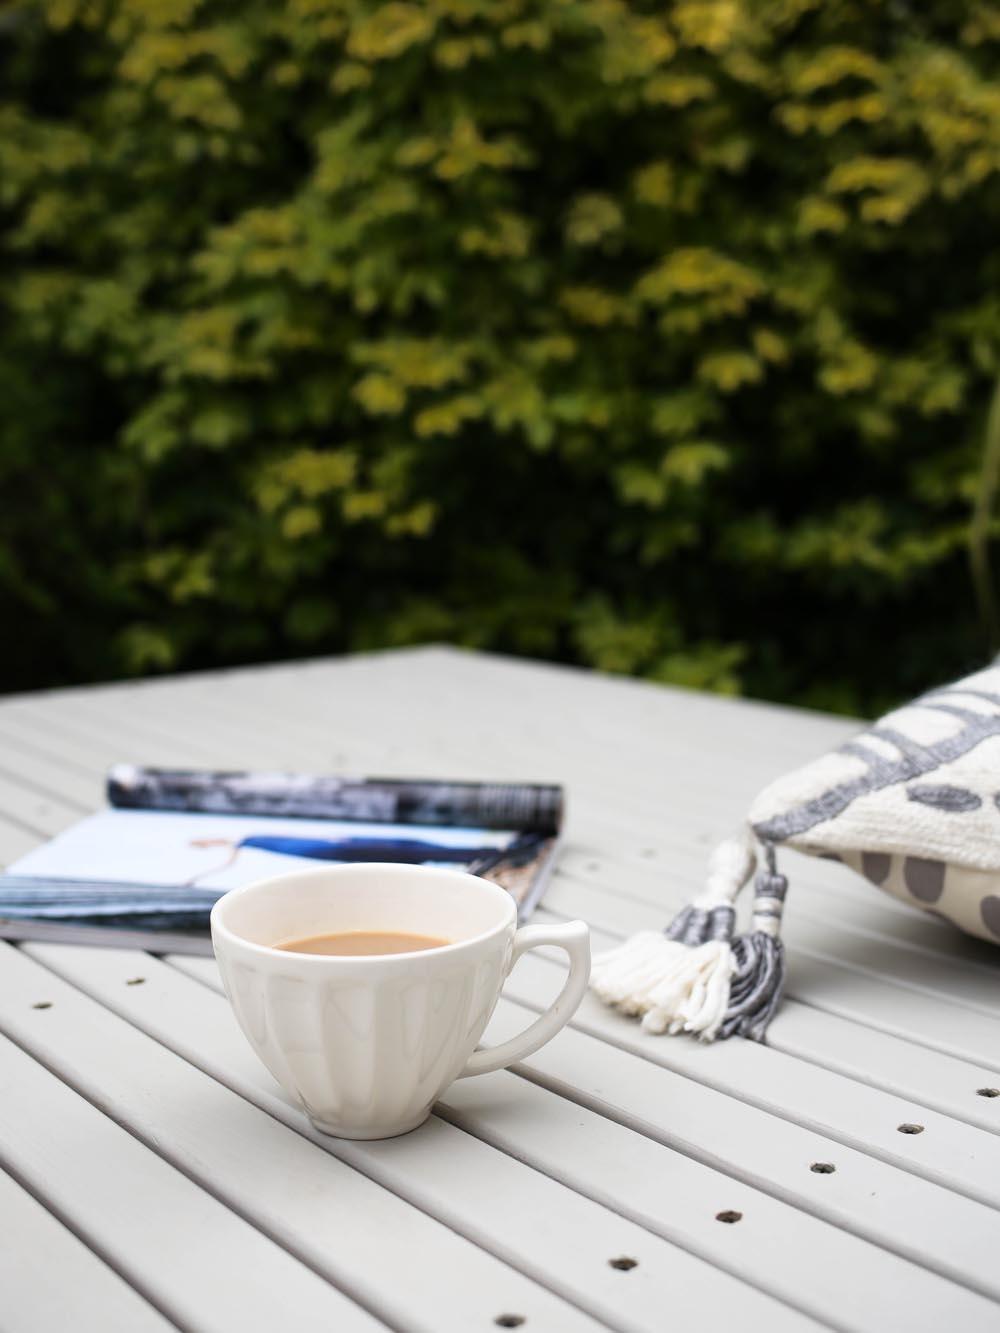 A cup of tea in the garden | Design Hunter